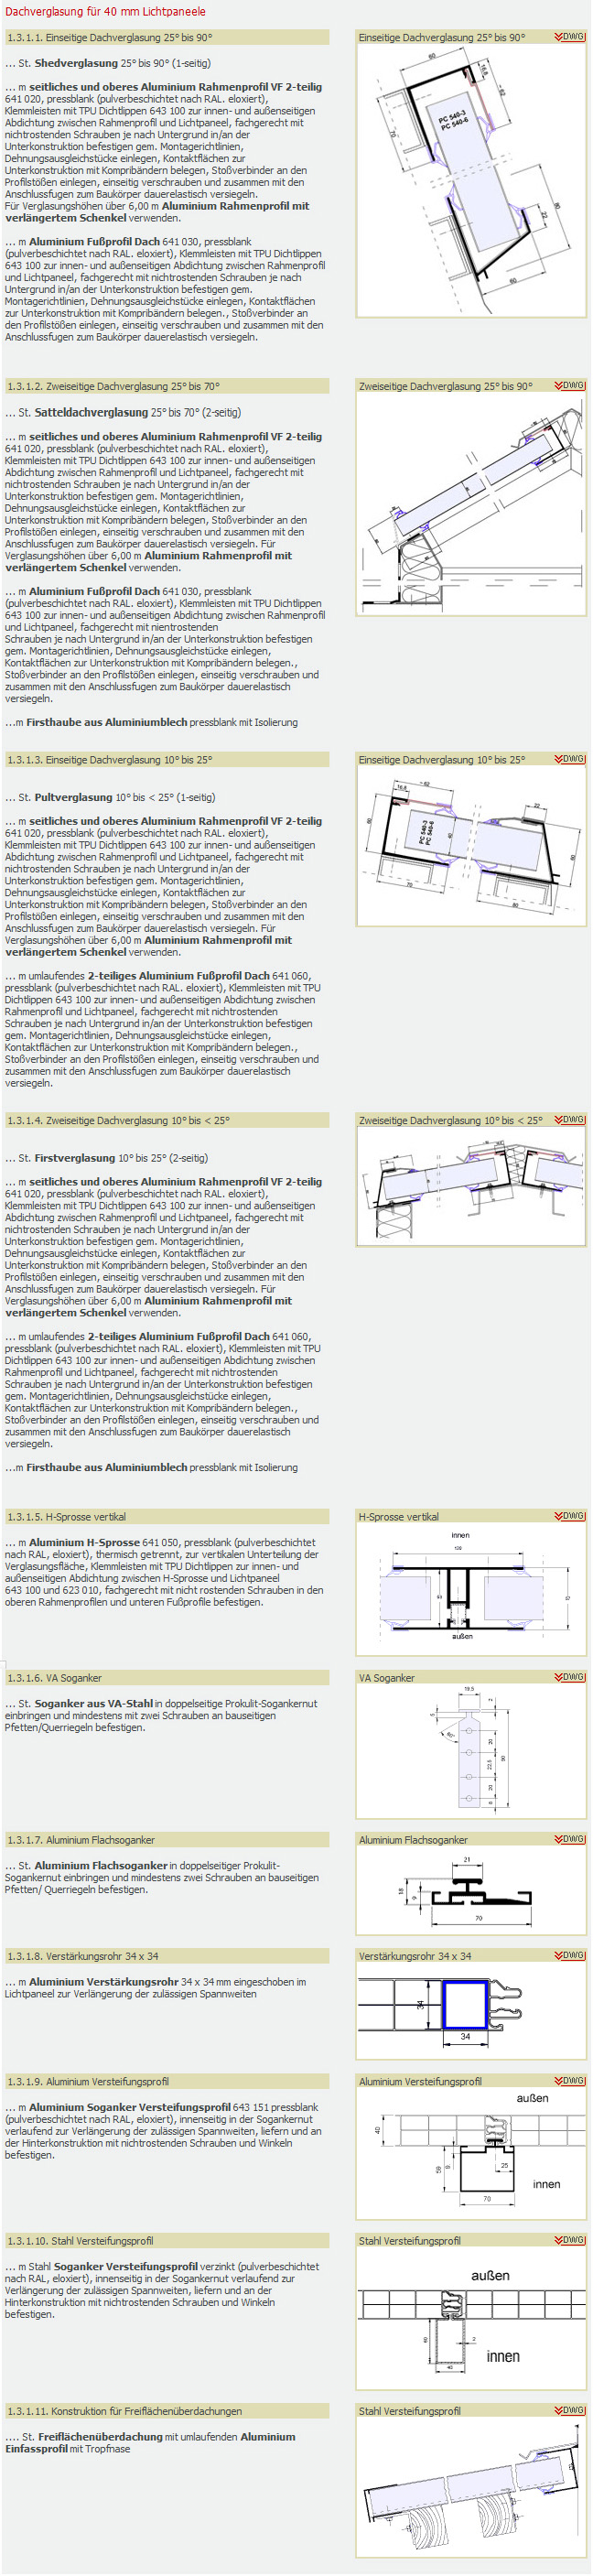 prokulit-dach-lv40